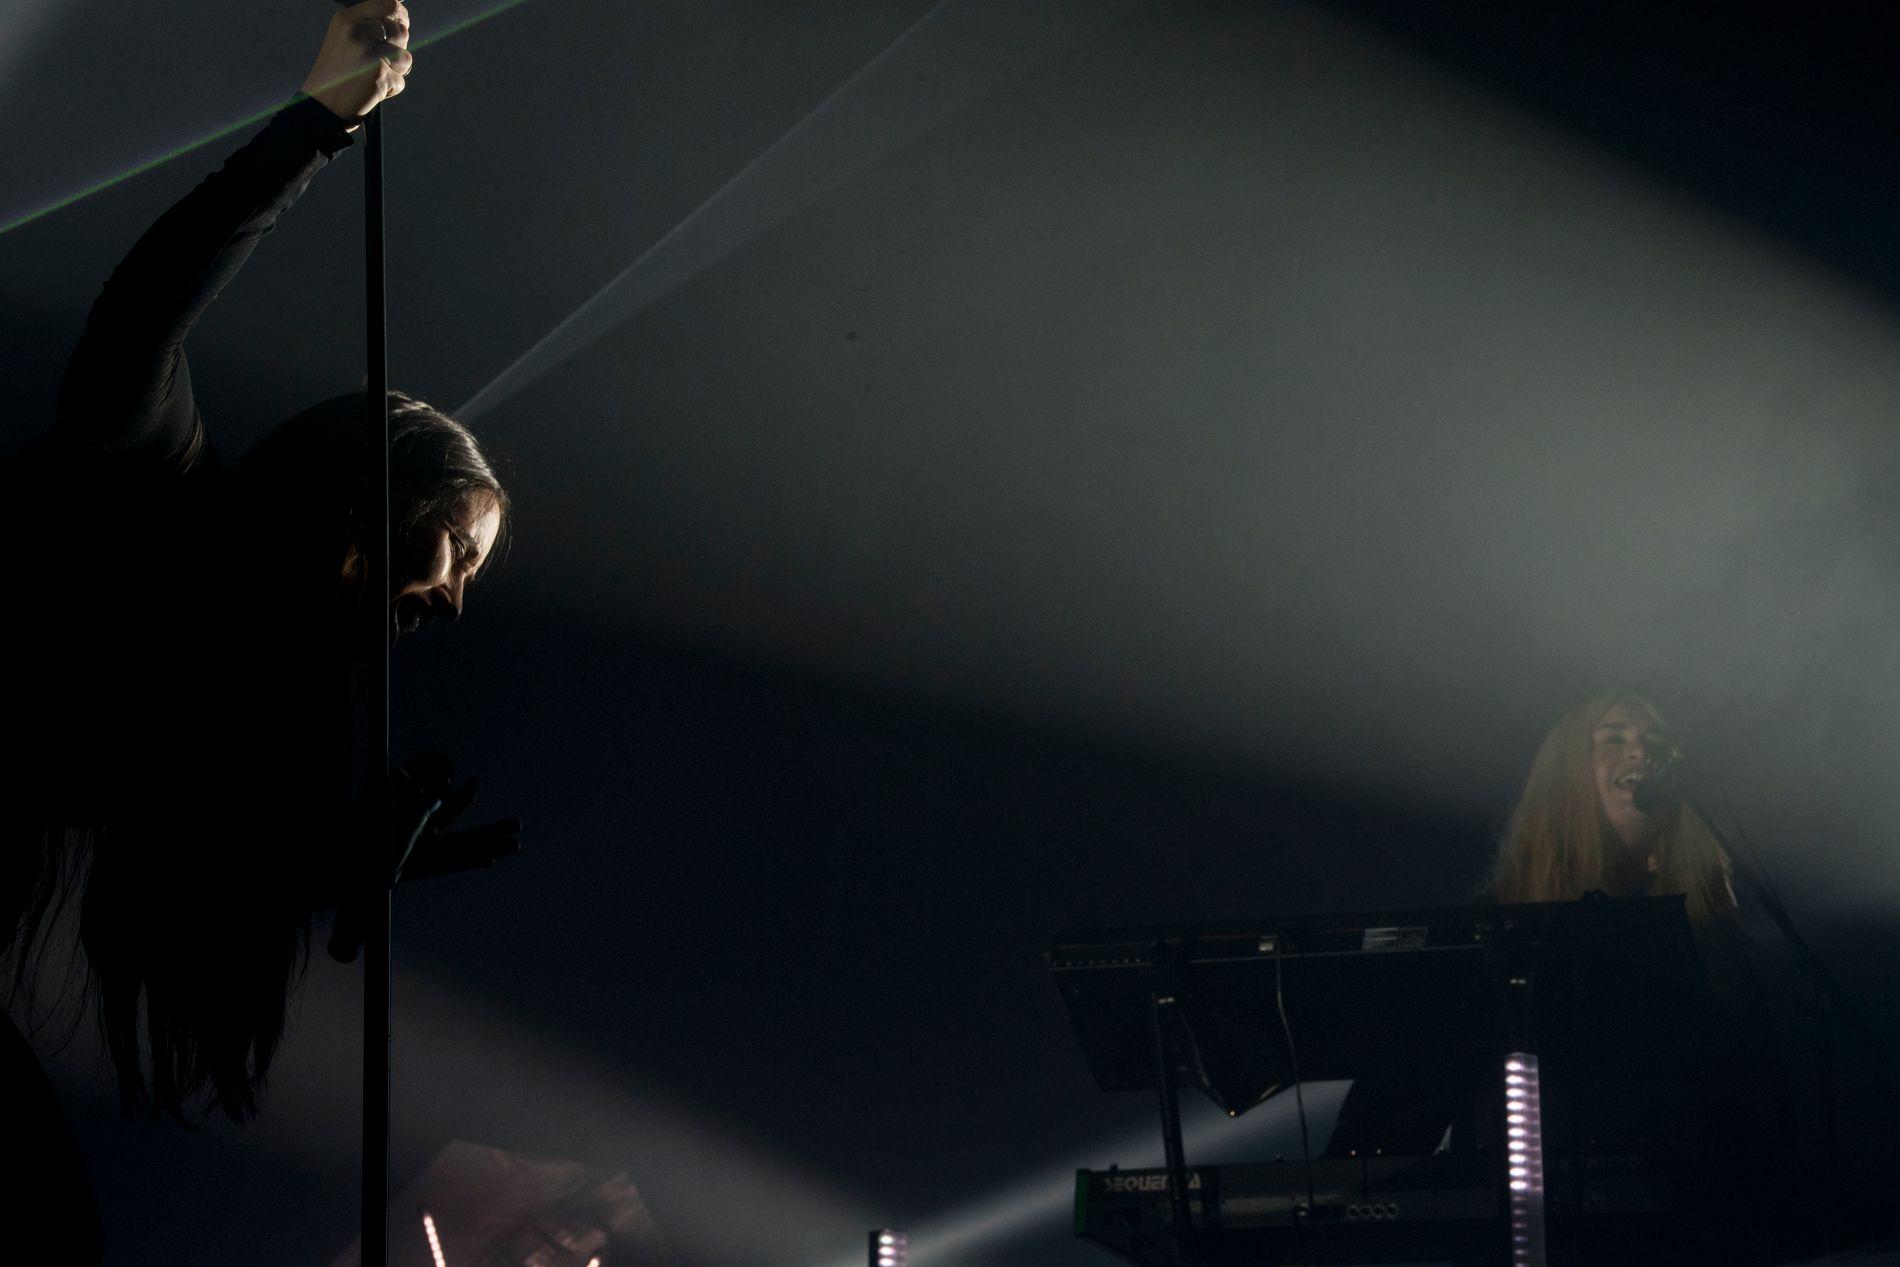 MØRKT: Ingrid Helene Håvik (t.v.) og Marte Eberson under deres siste konsert sammen, i Dødens Dal i Trondheim 12. oktober 2017.